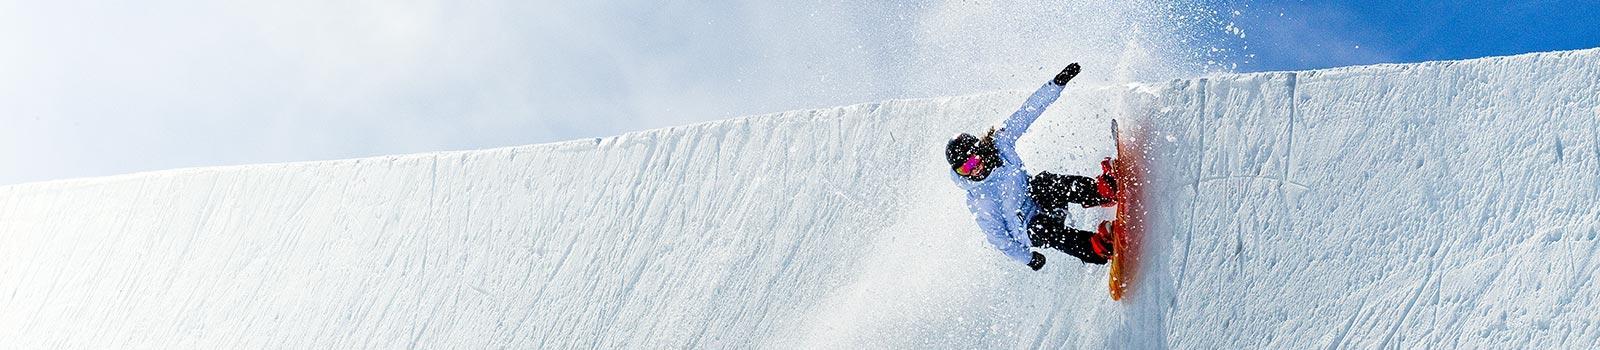 Сноубординг женщинам